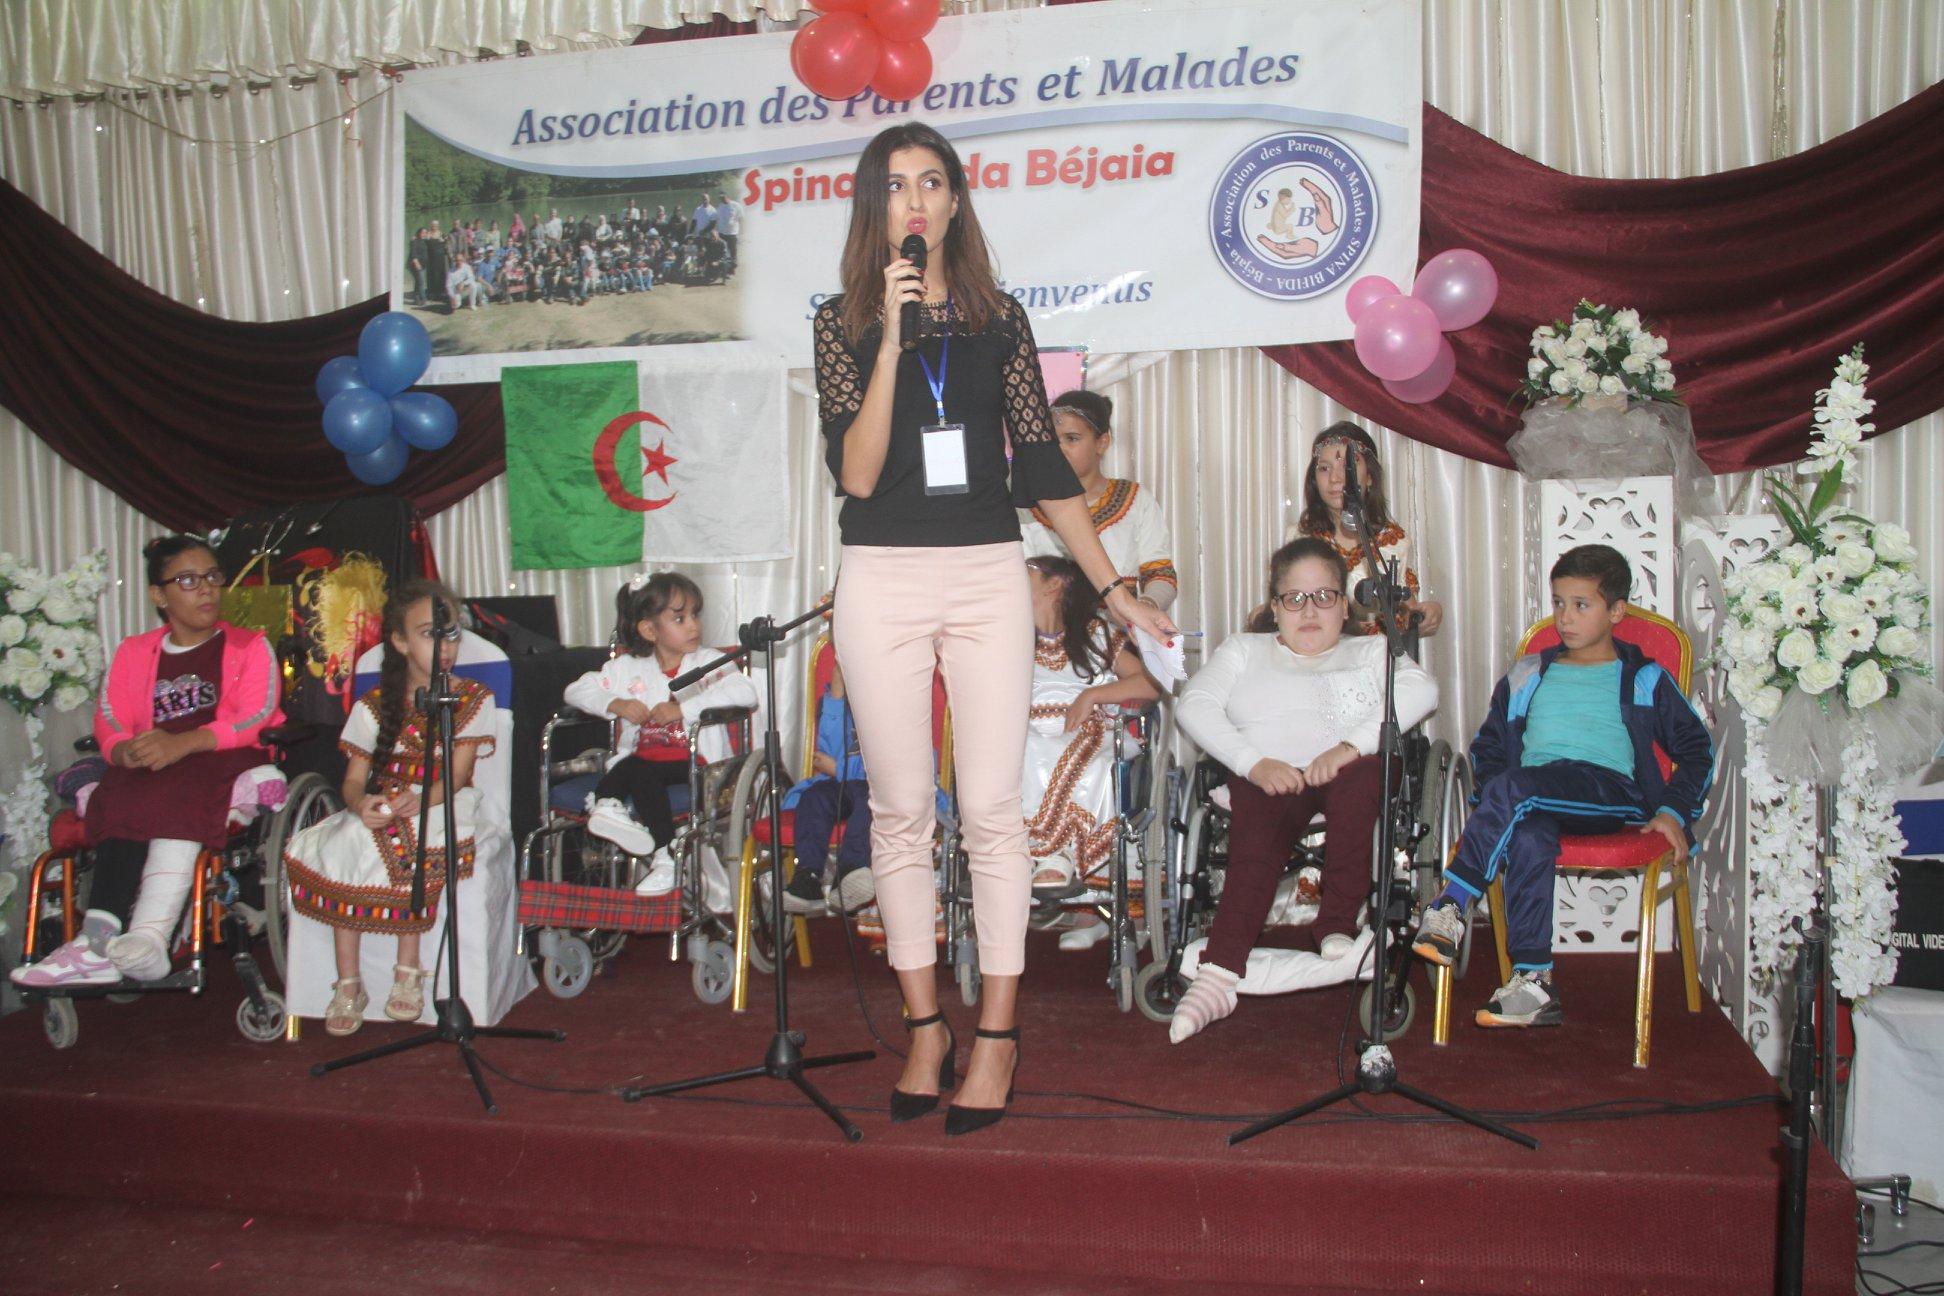 Algerian Spina Bifida Association